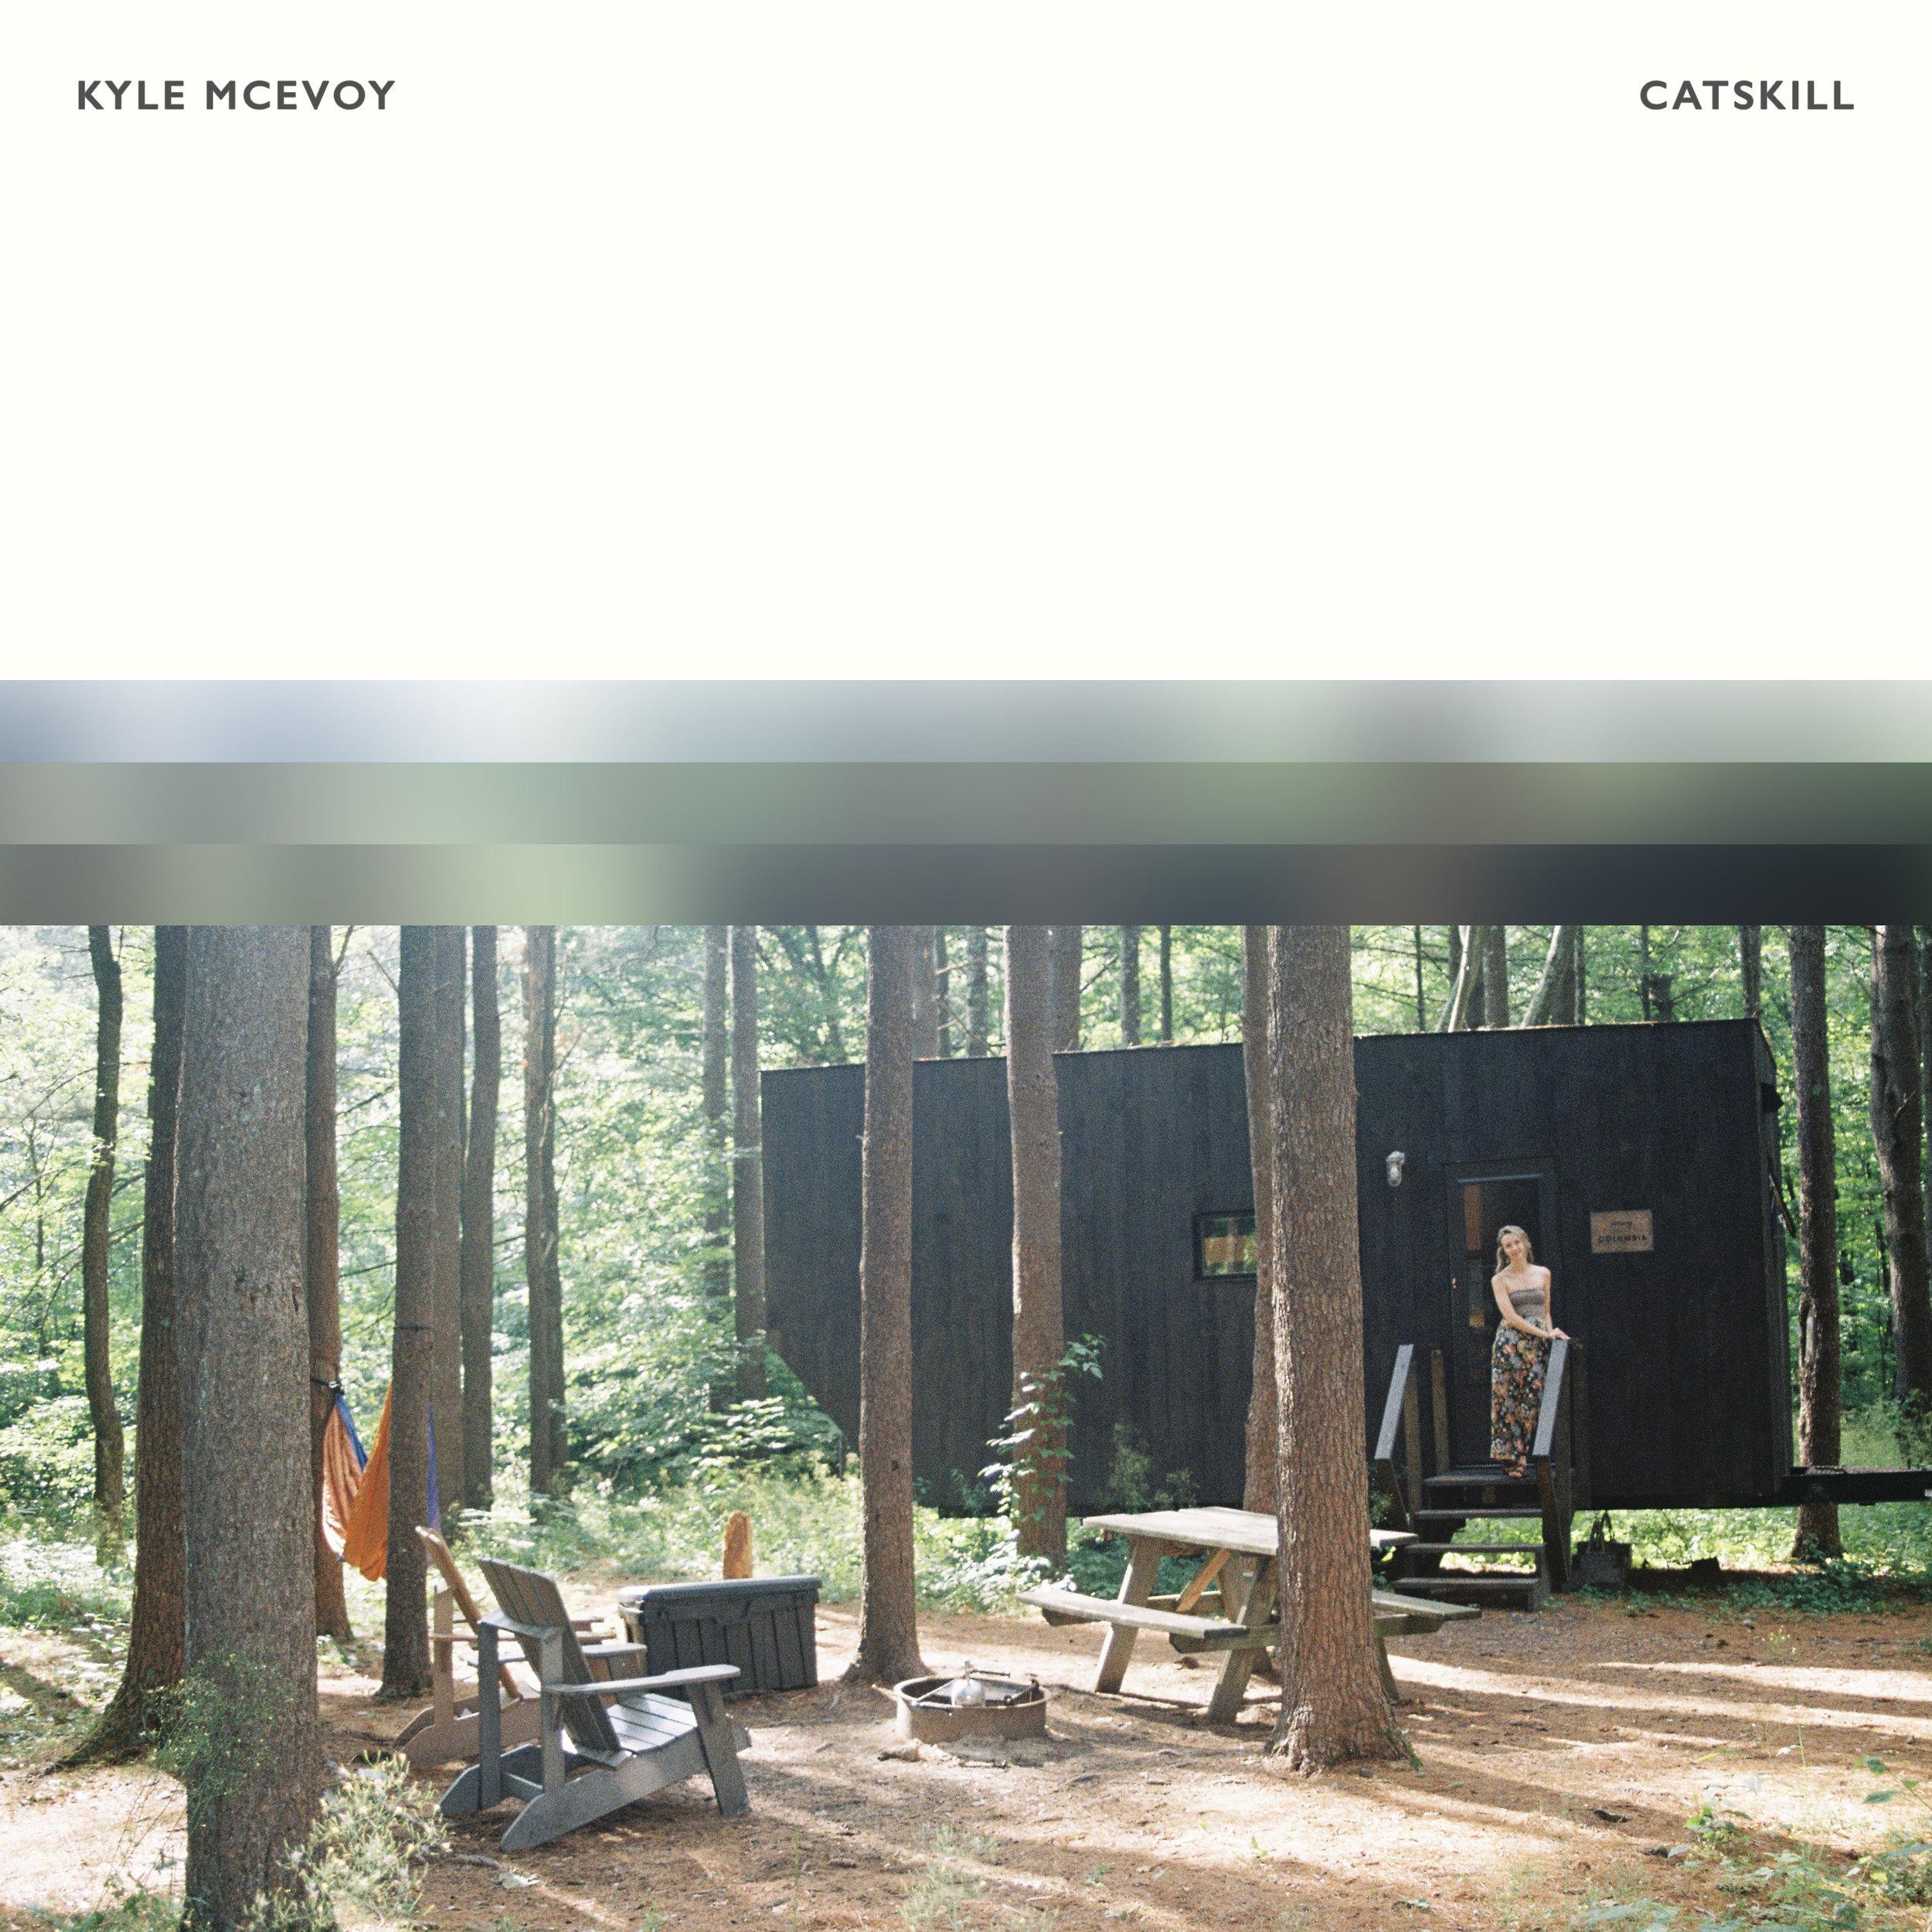 Kyle McEvoy - Catskill